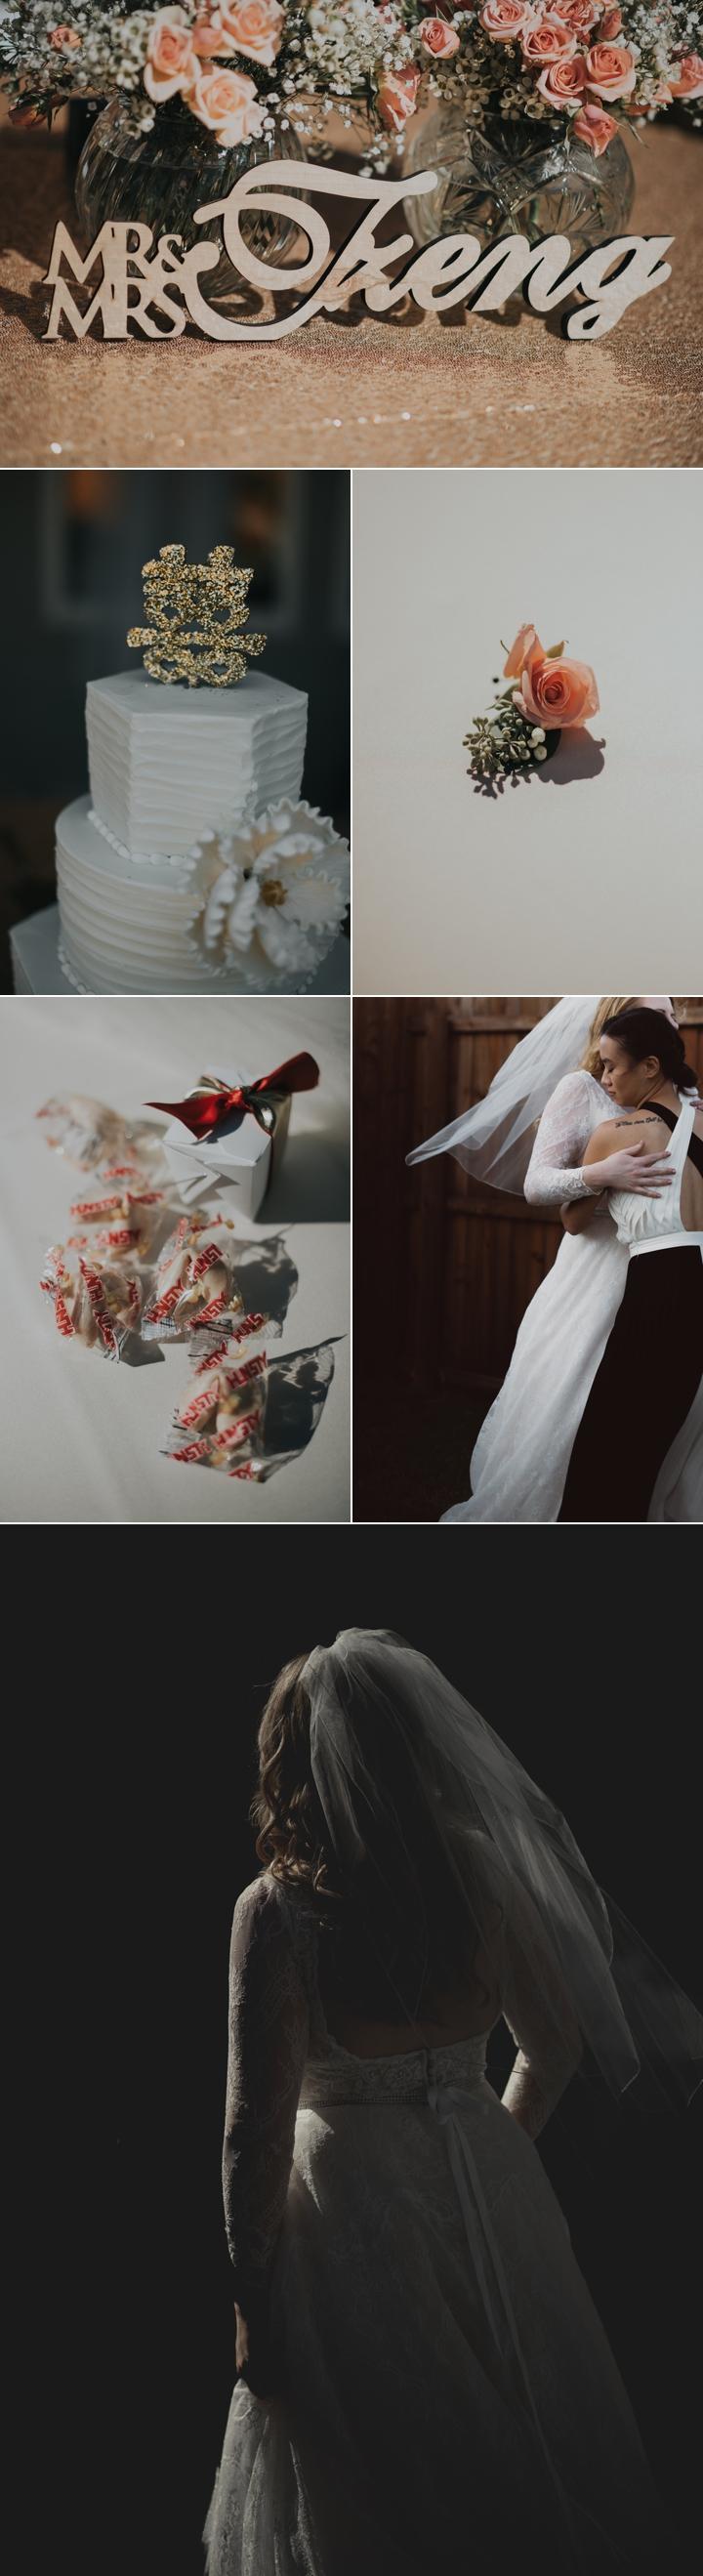 dallas-wedding-photographers-vb 12.jpg